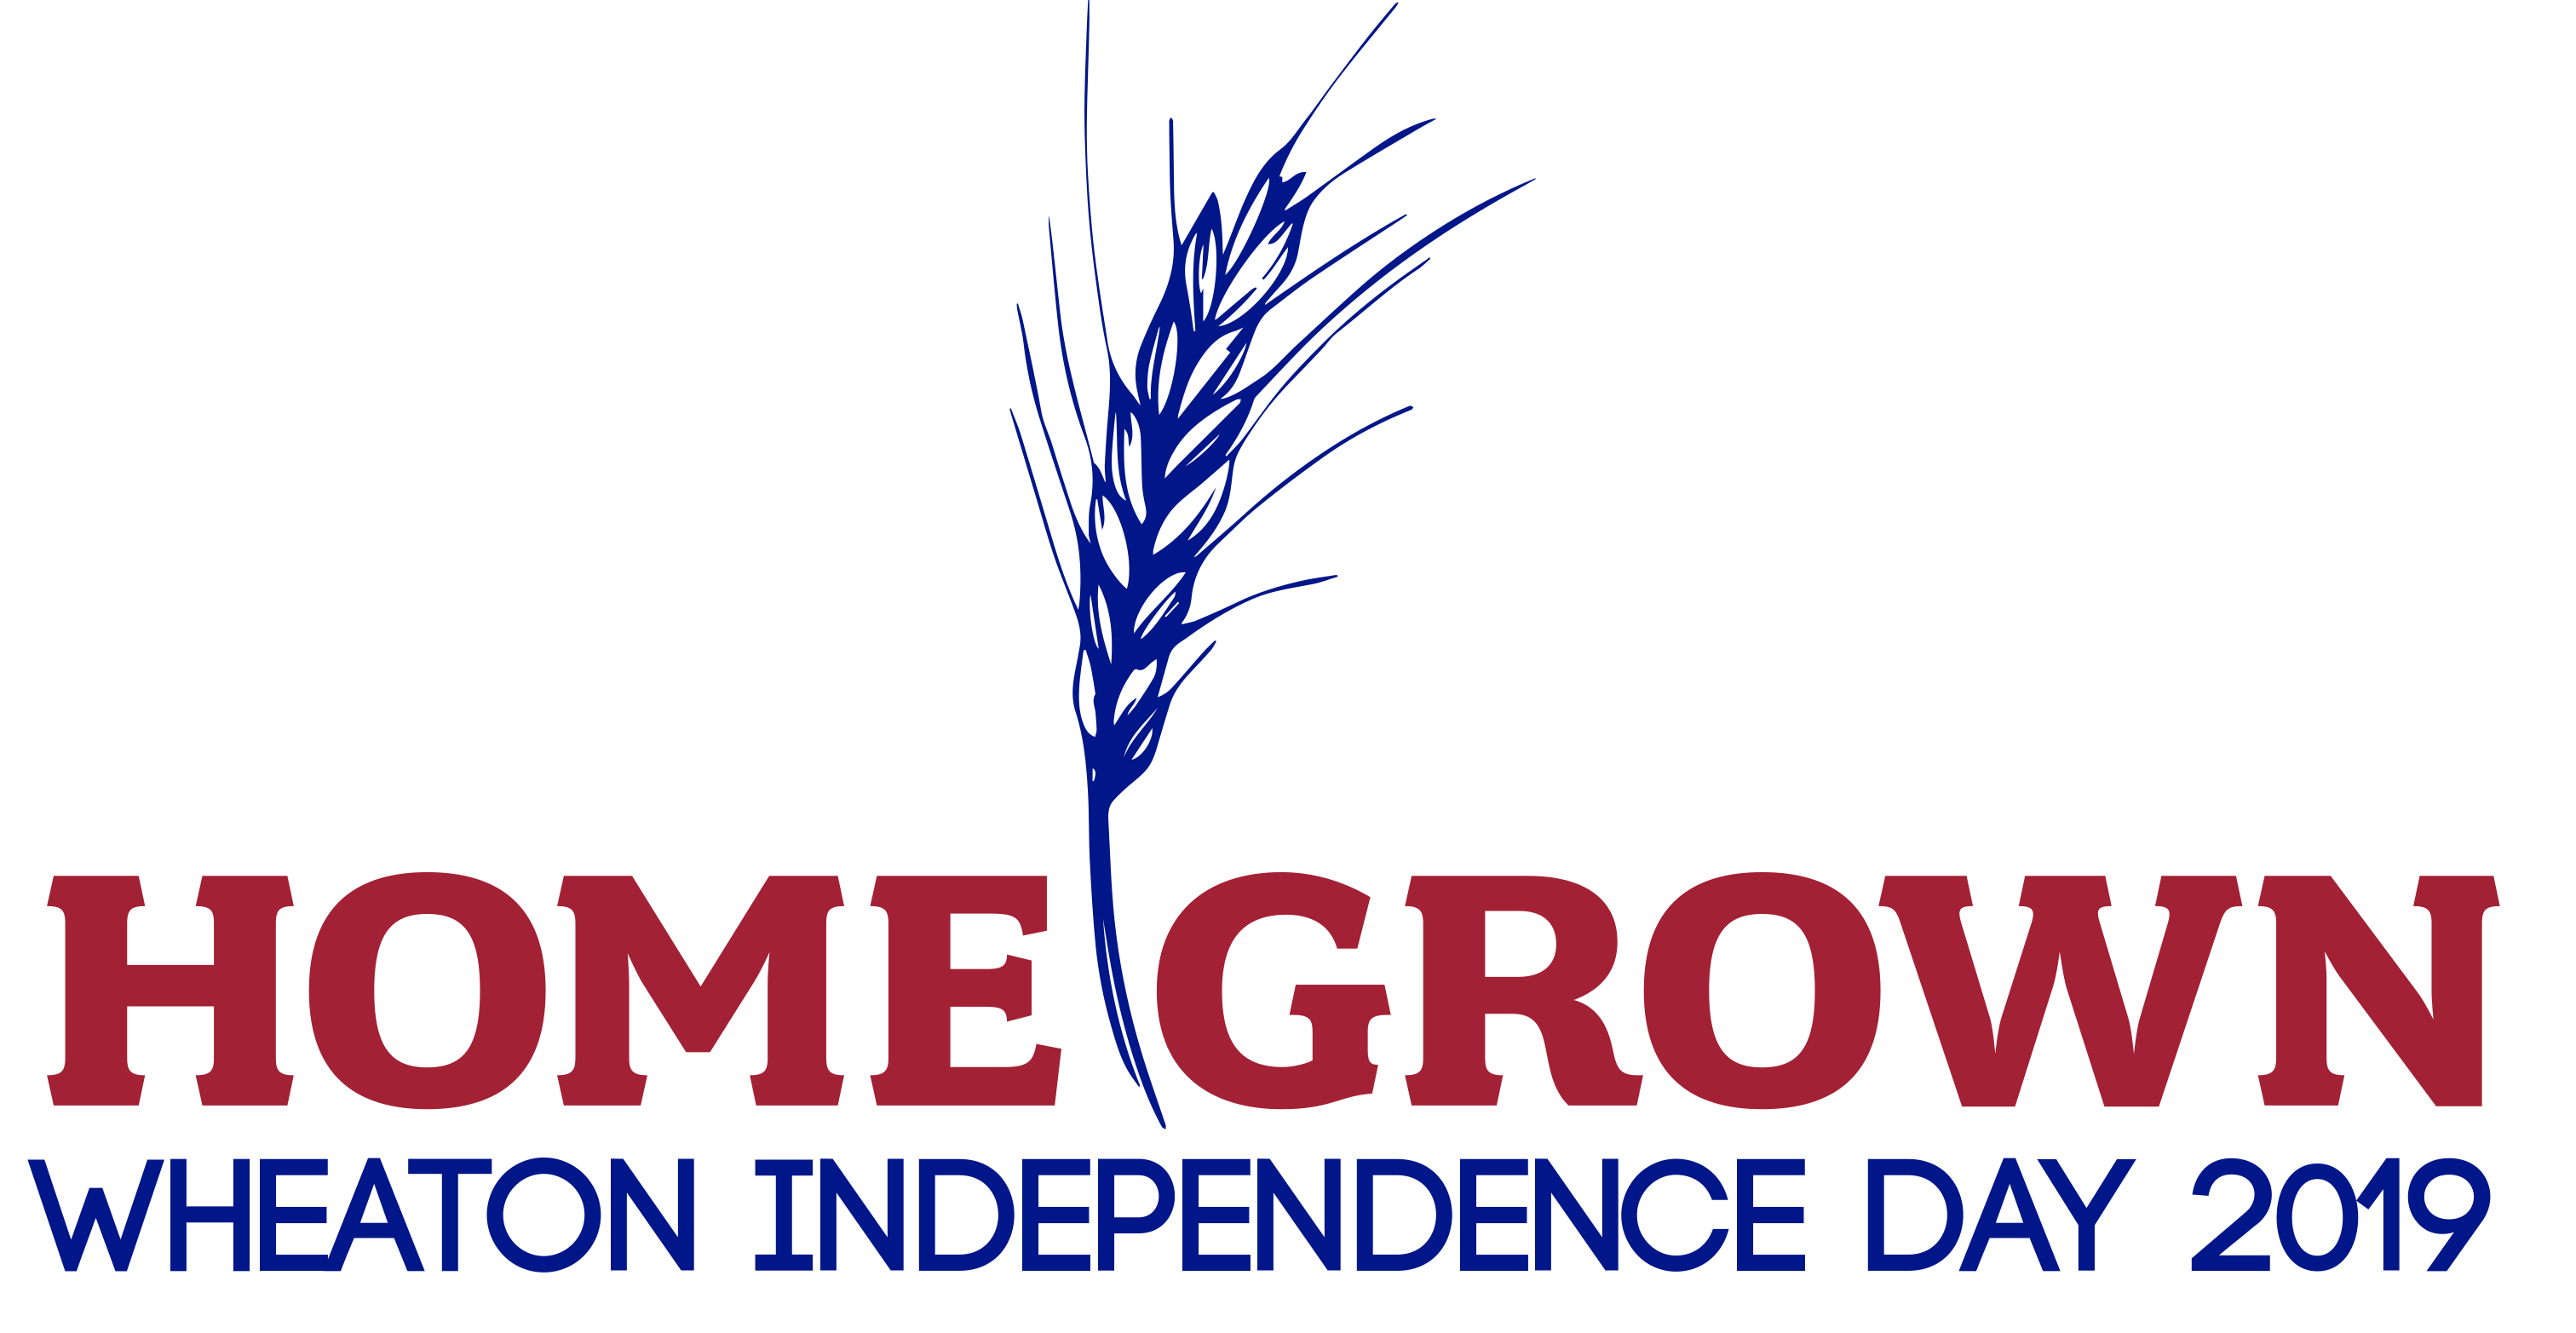 Home Grown 2019